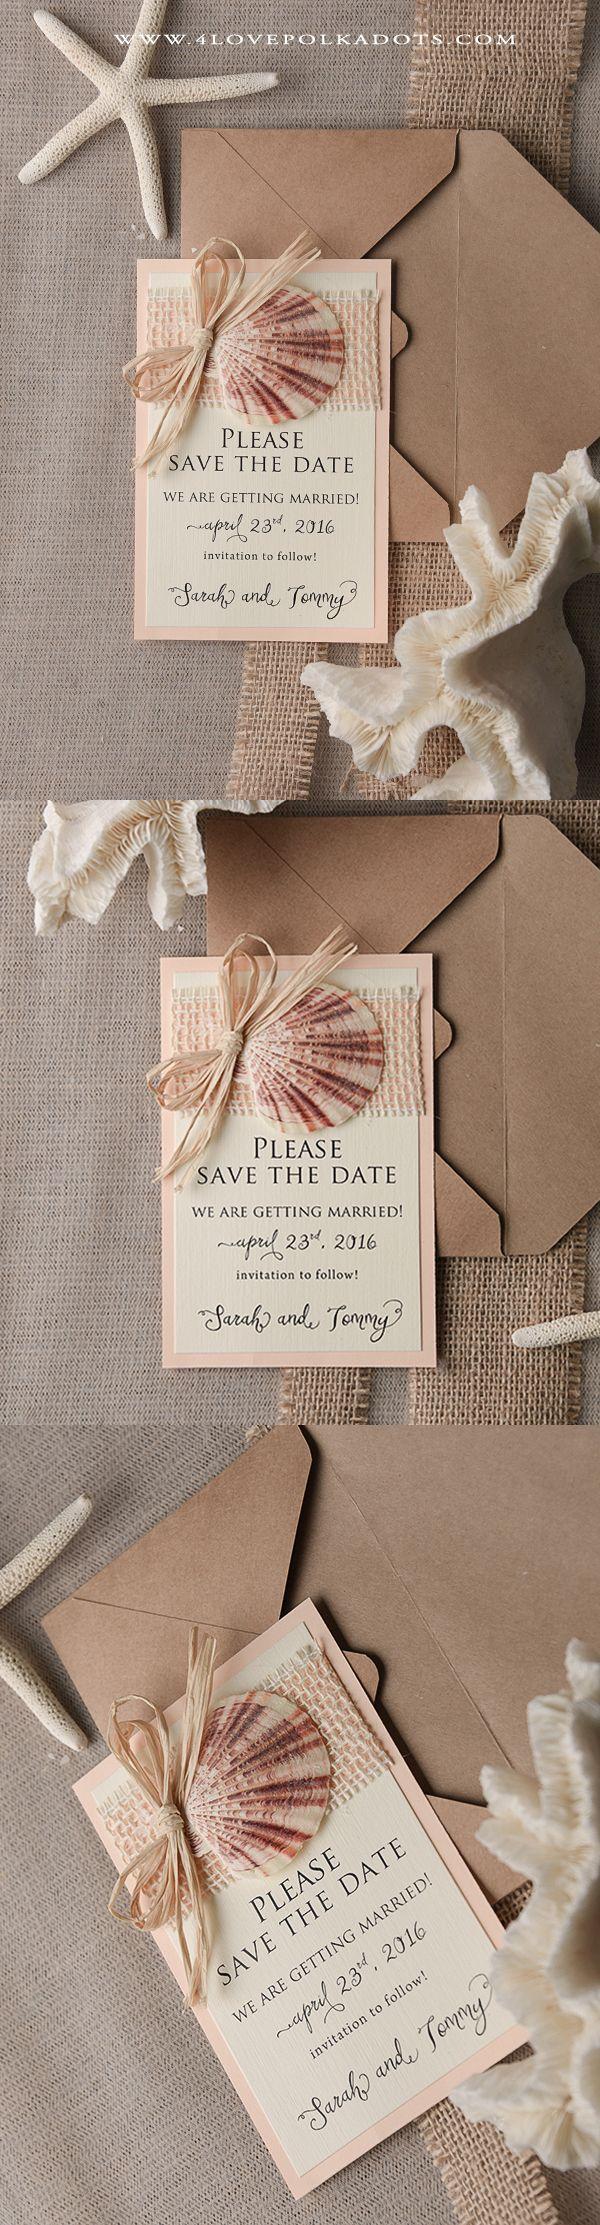 destination wedding save the dates and invitations%0A Wedding Beach Save the Date Card  beachwedding  destinationwedding   seashell  sea